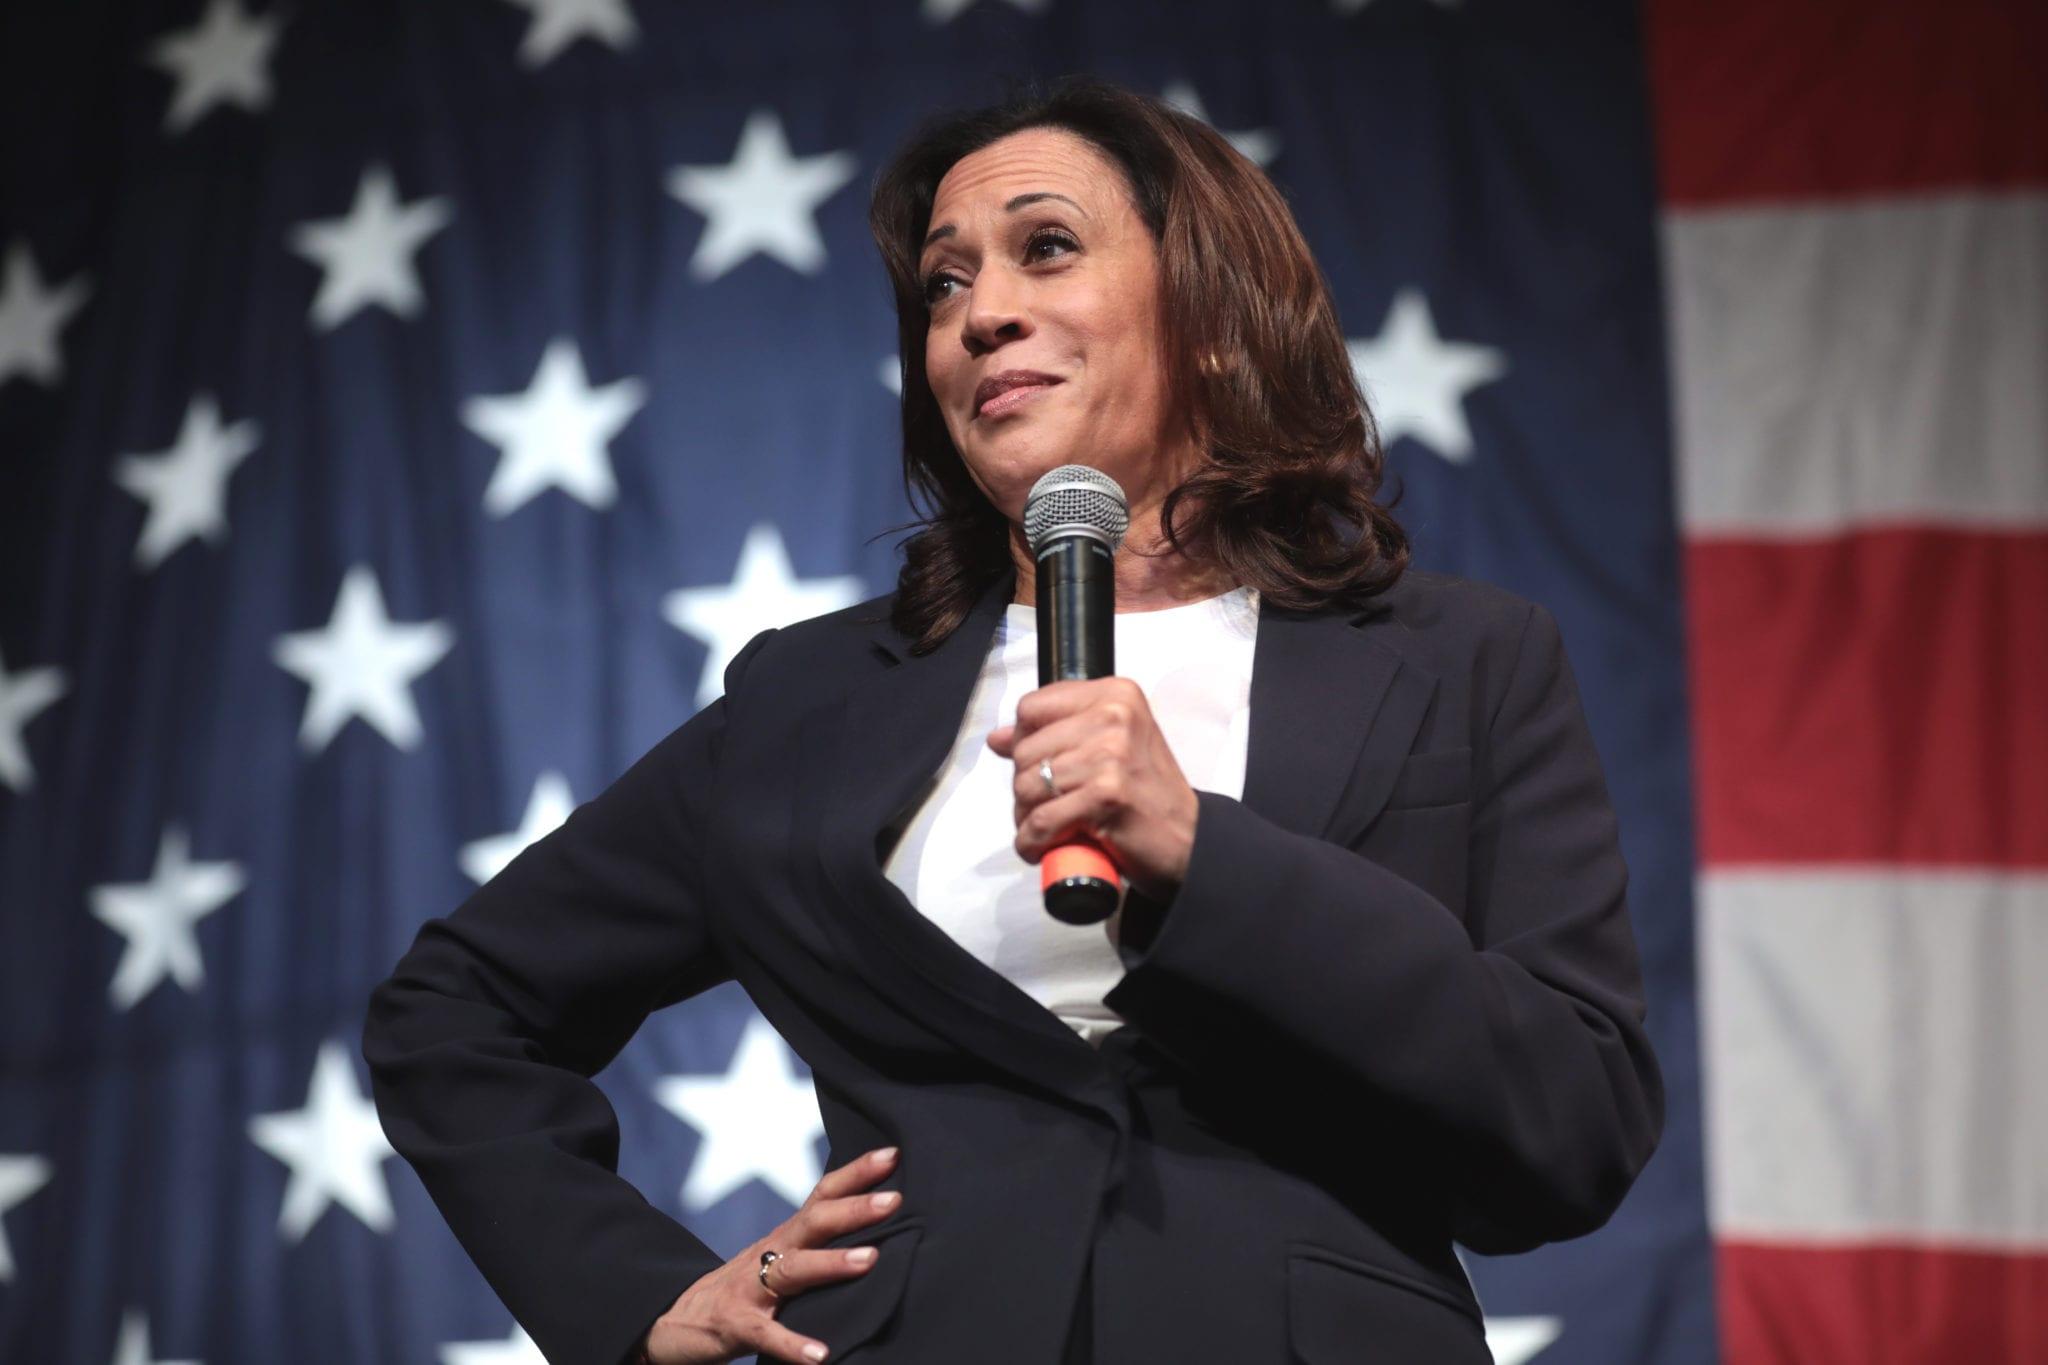 Cannabis stocks surge after Kamala Harris said Biden administration would decriminalize